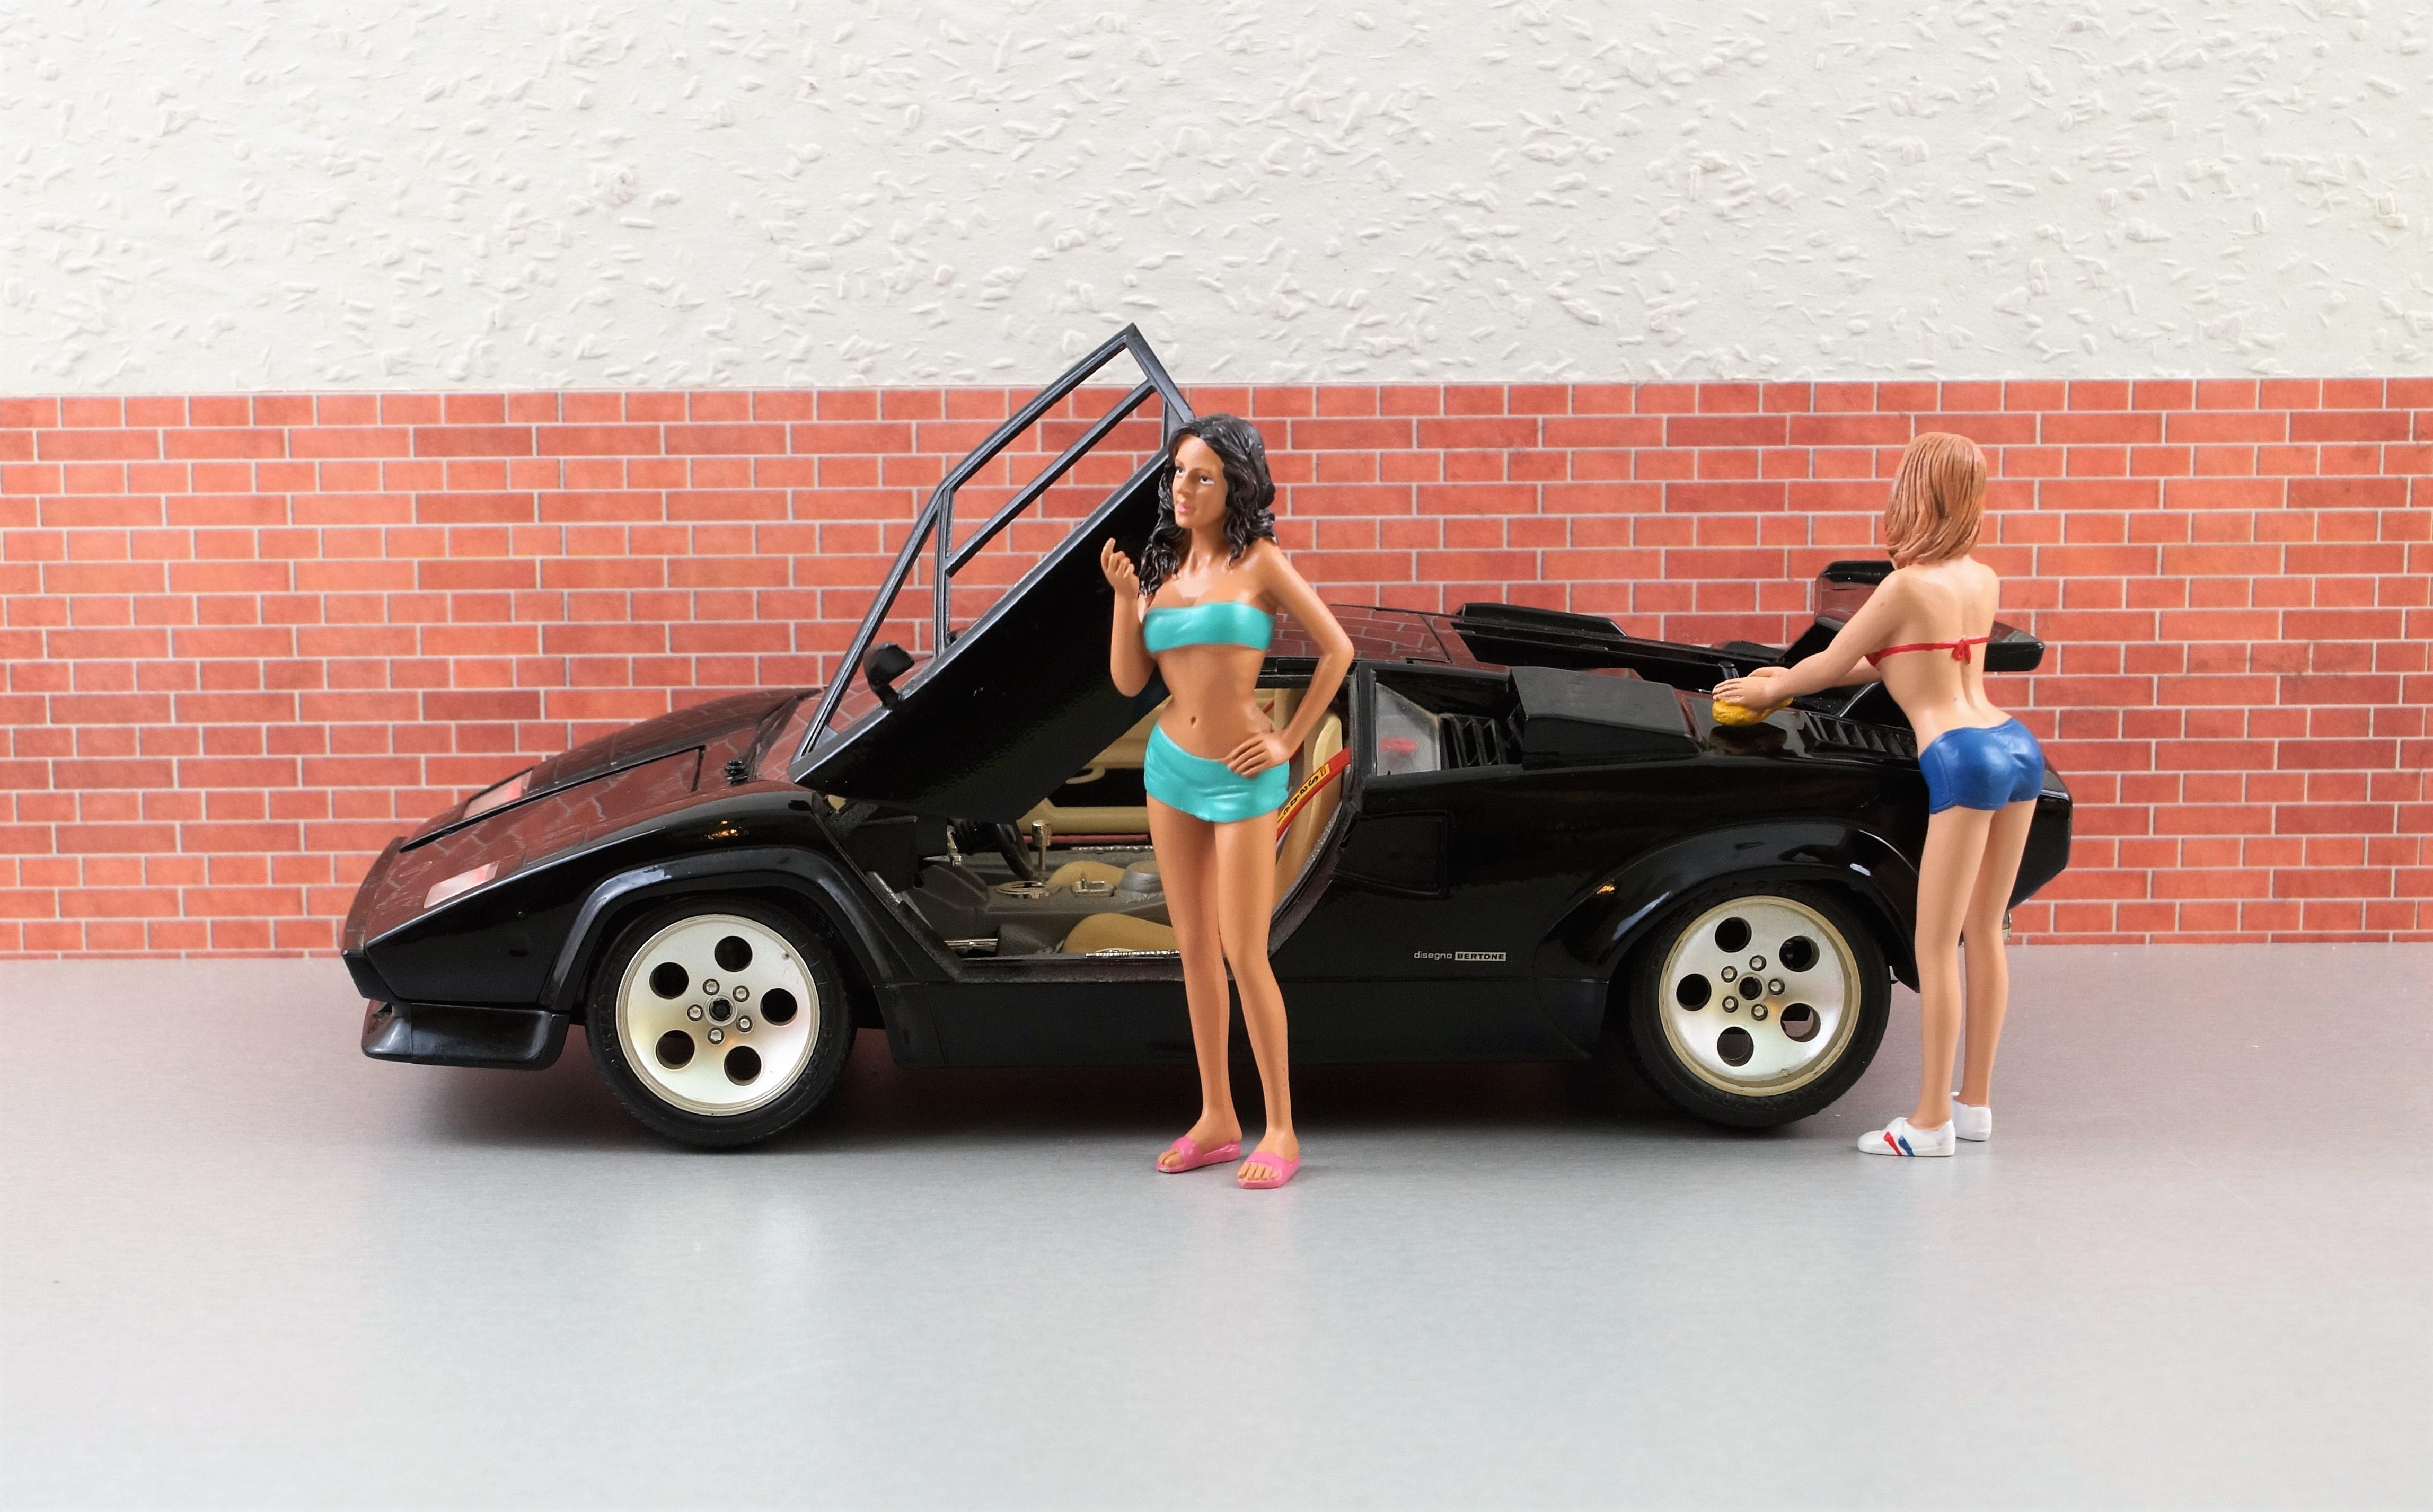 Free Images : Girl, Woman, Female, Auto, Black, Bikini, Sports Car,  Supercar, Toys, Beautiful, Oldtimer, Sexy, Lamborghini, Vehicles, Erotic,  Racing Car, ...